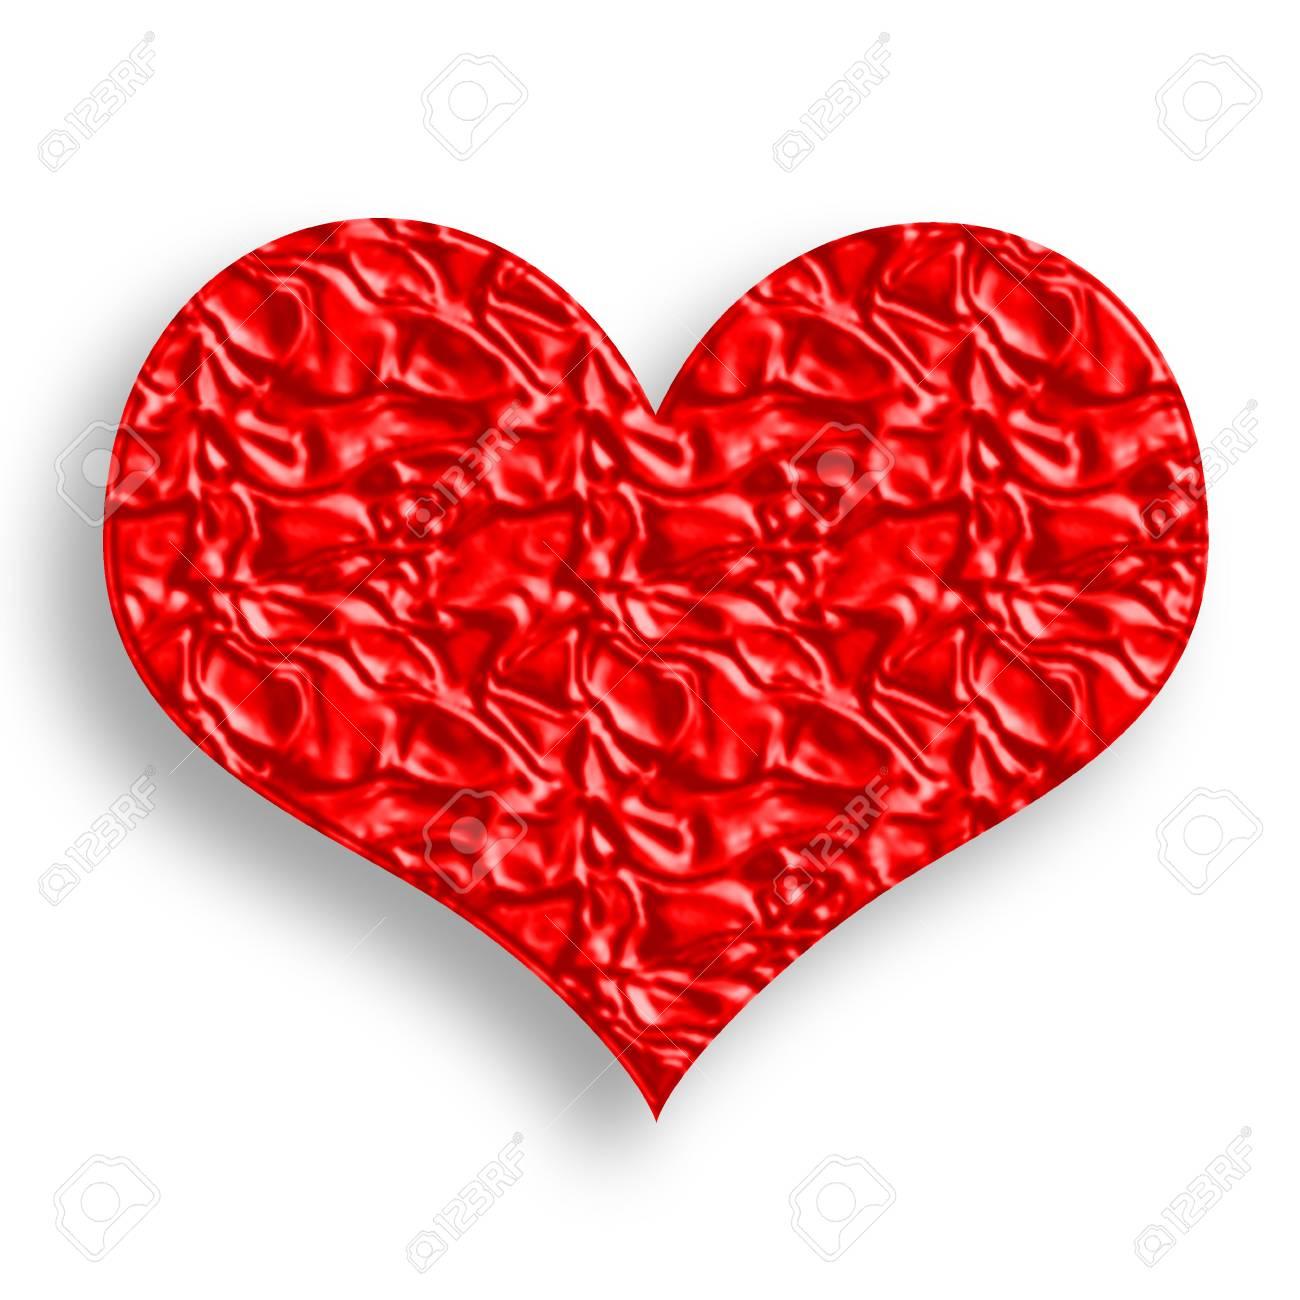 Wrinked Red Heart Symbol Illustration over White Background Stock Illustration - 6339941